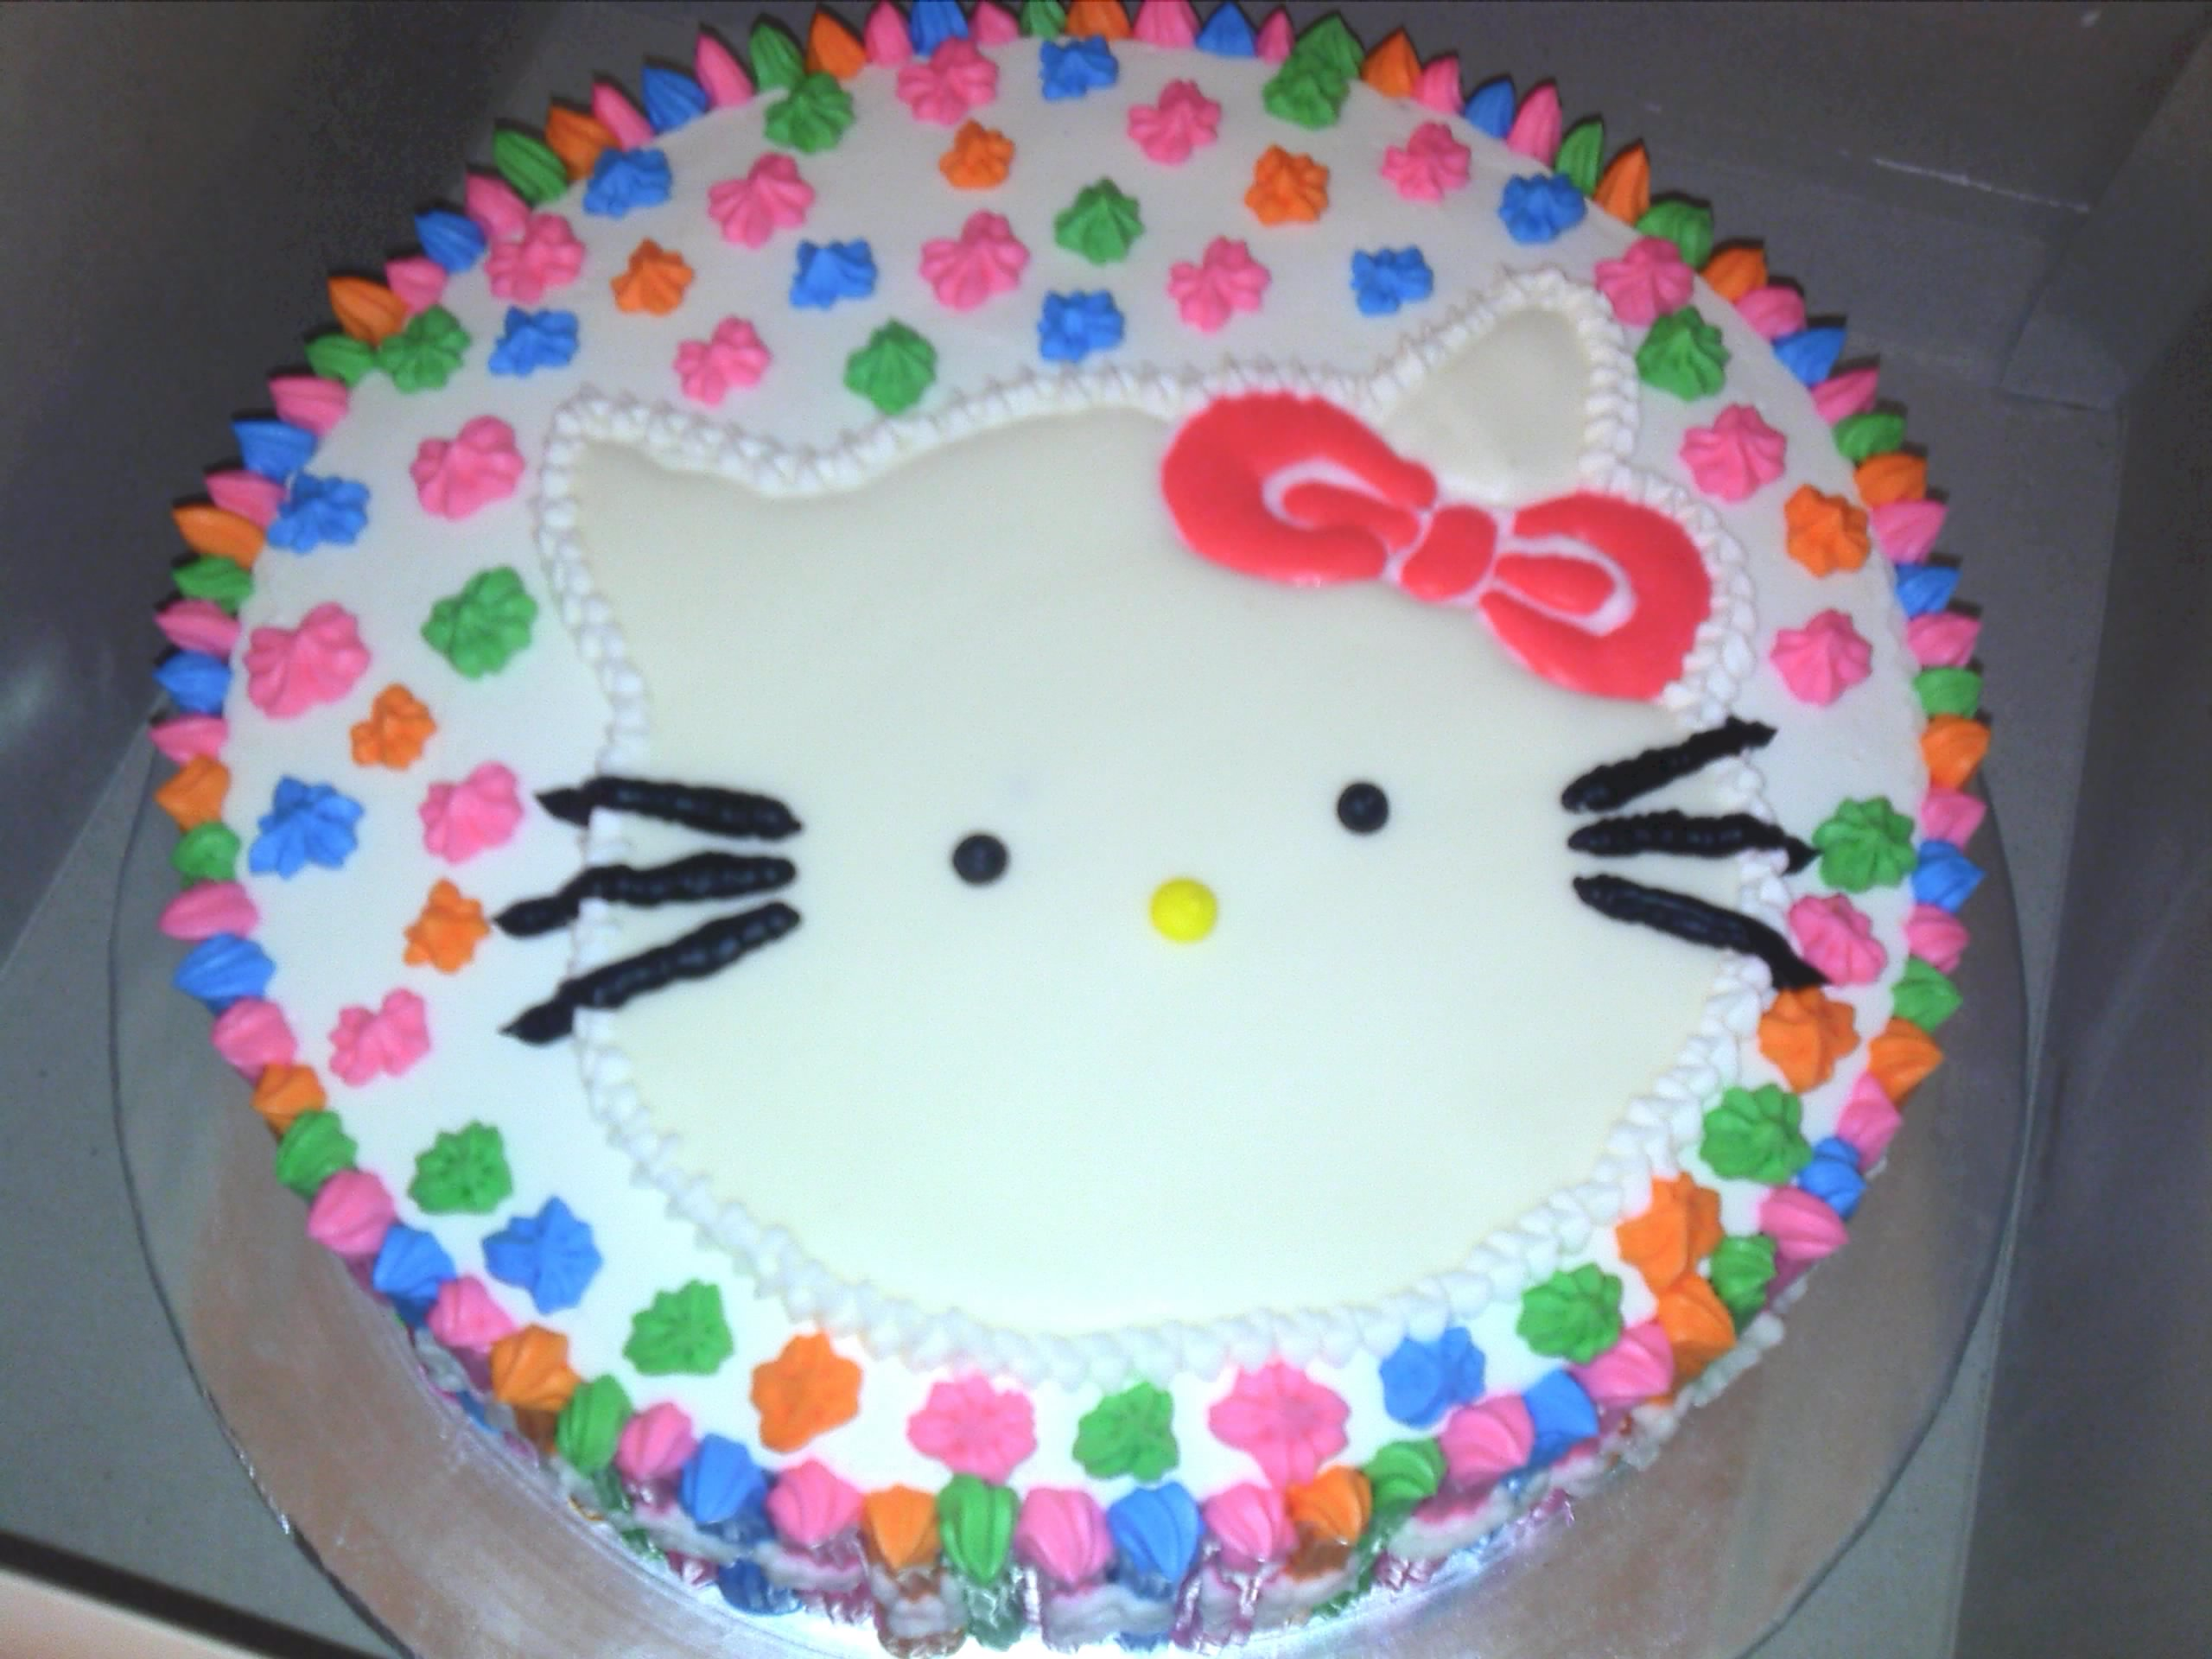 Variasi Cake Ultah Sfbakery